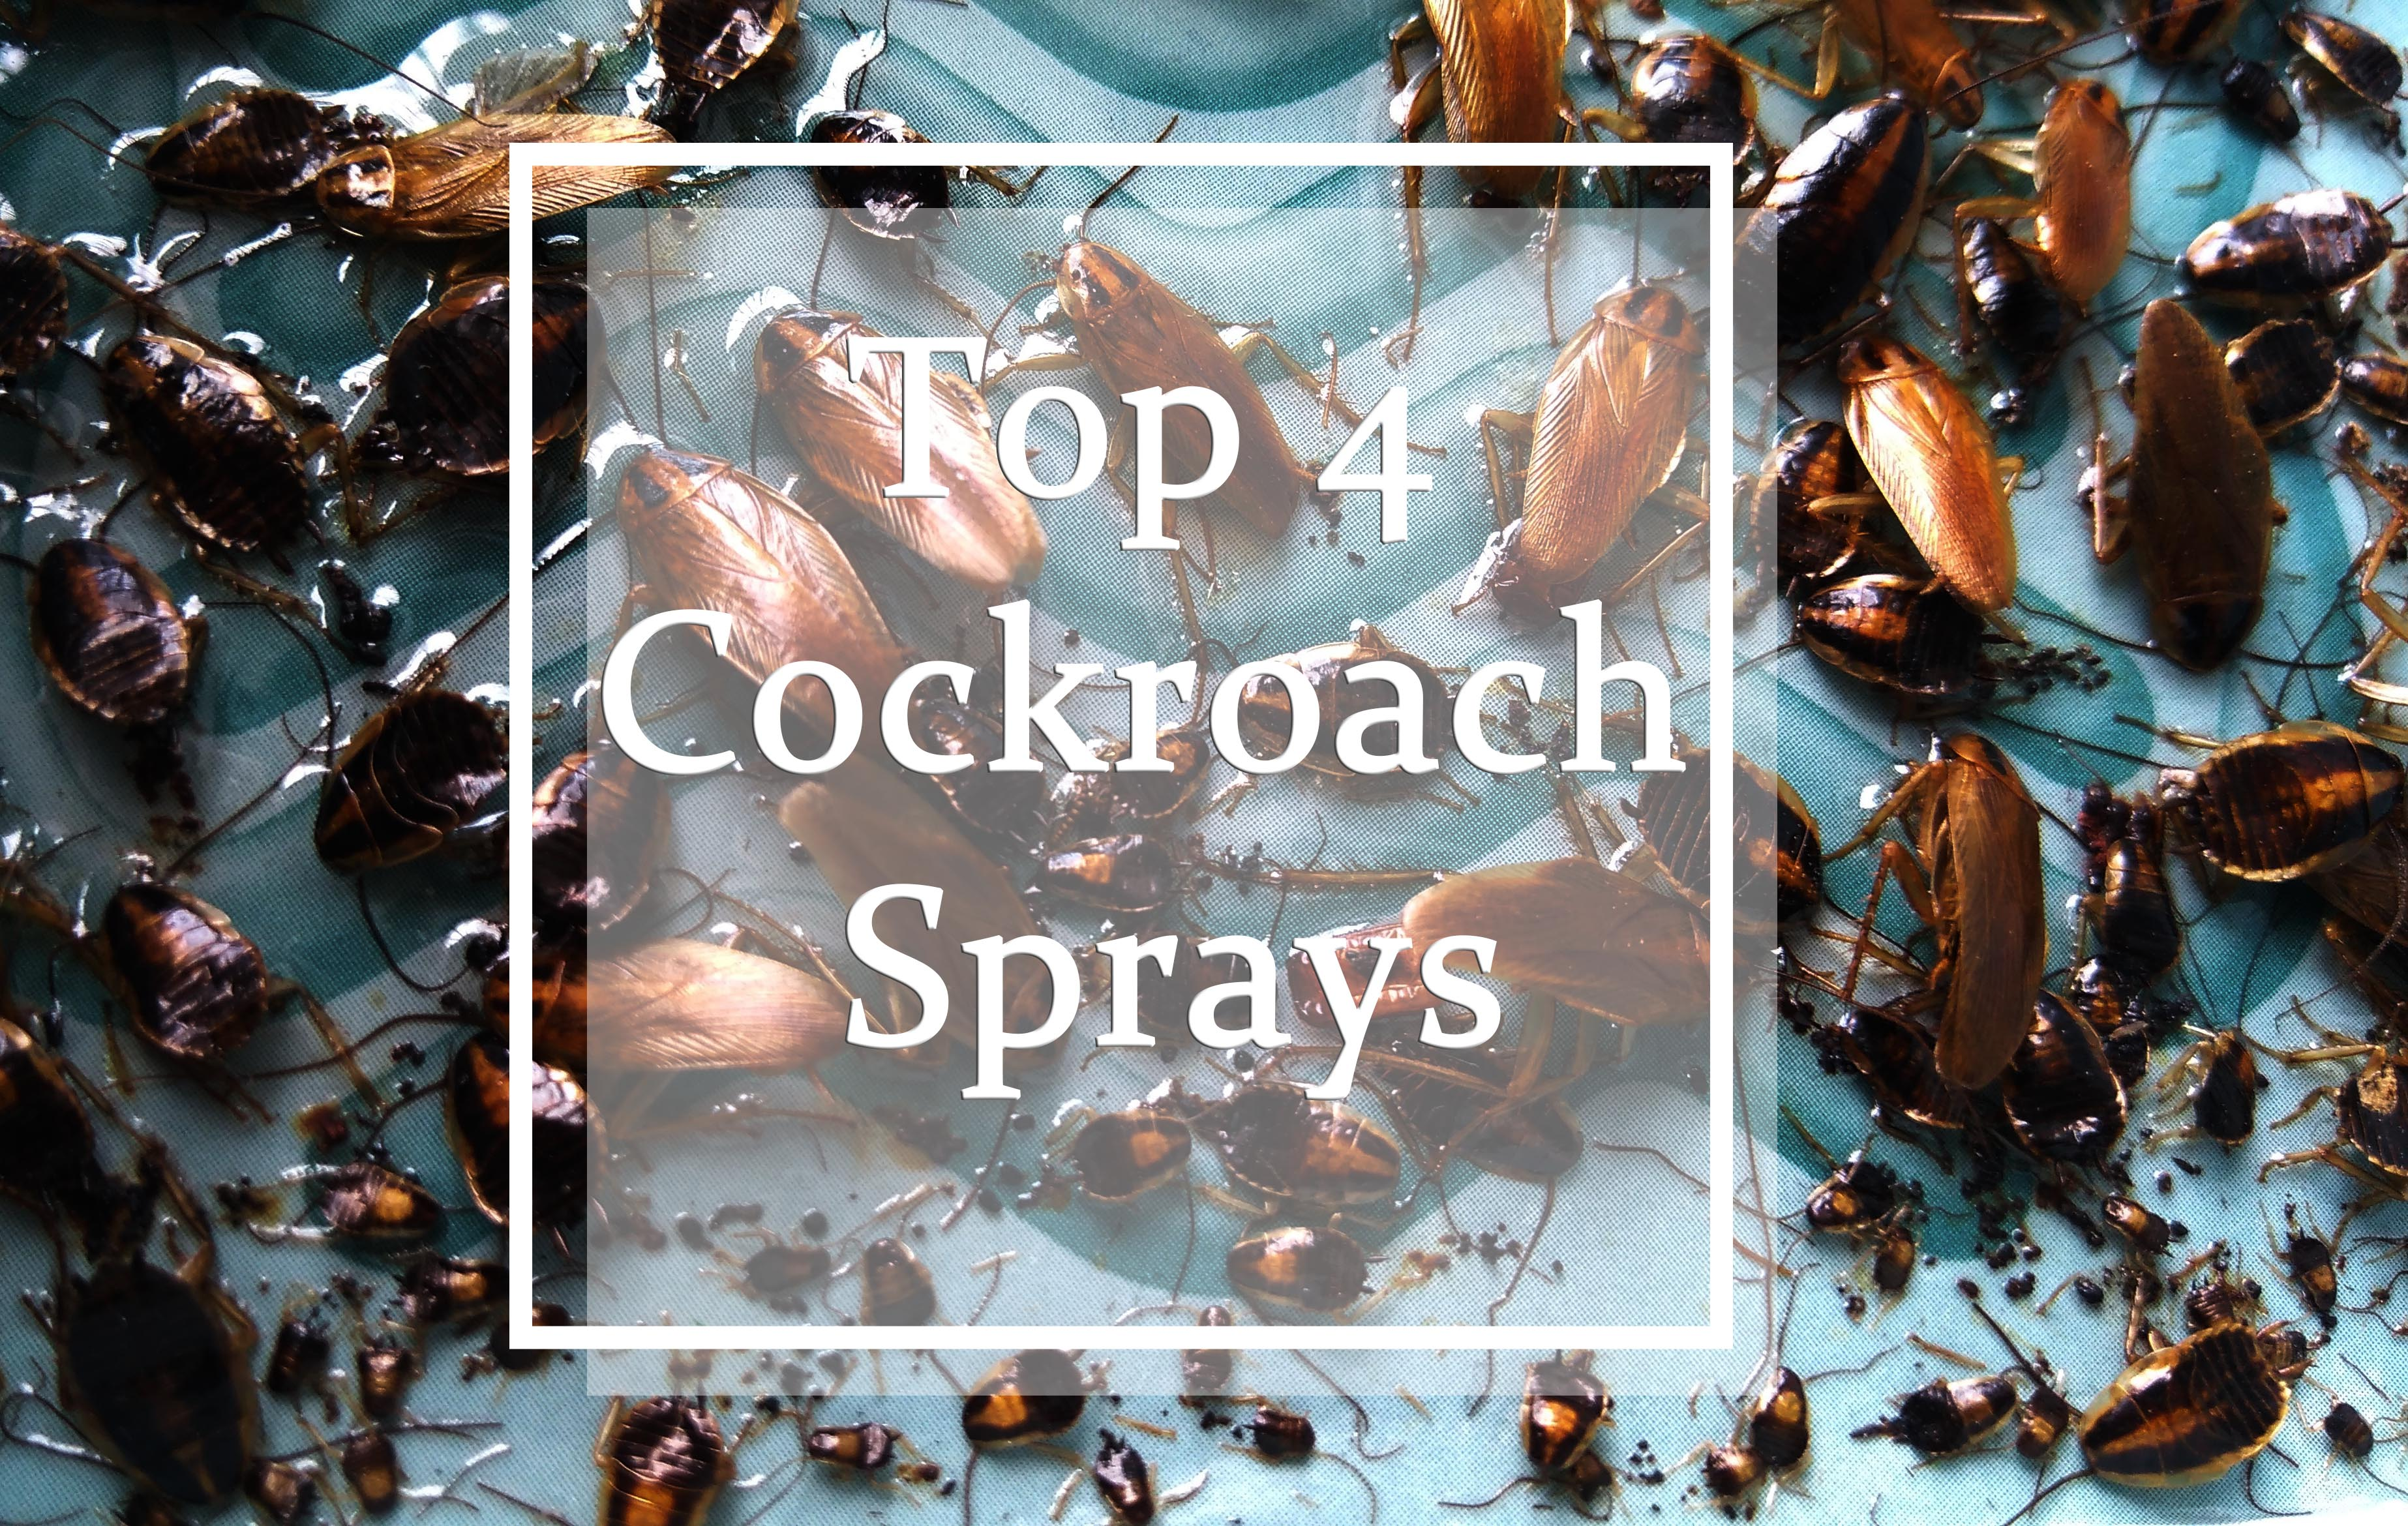 Best Cockroach Sprays